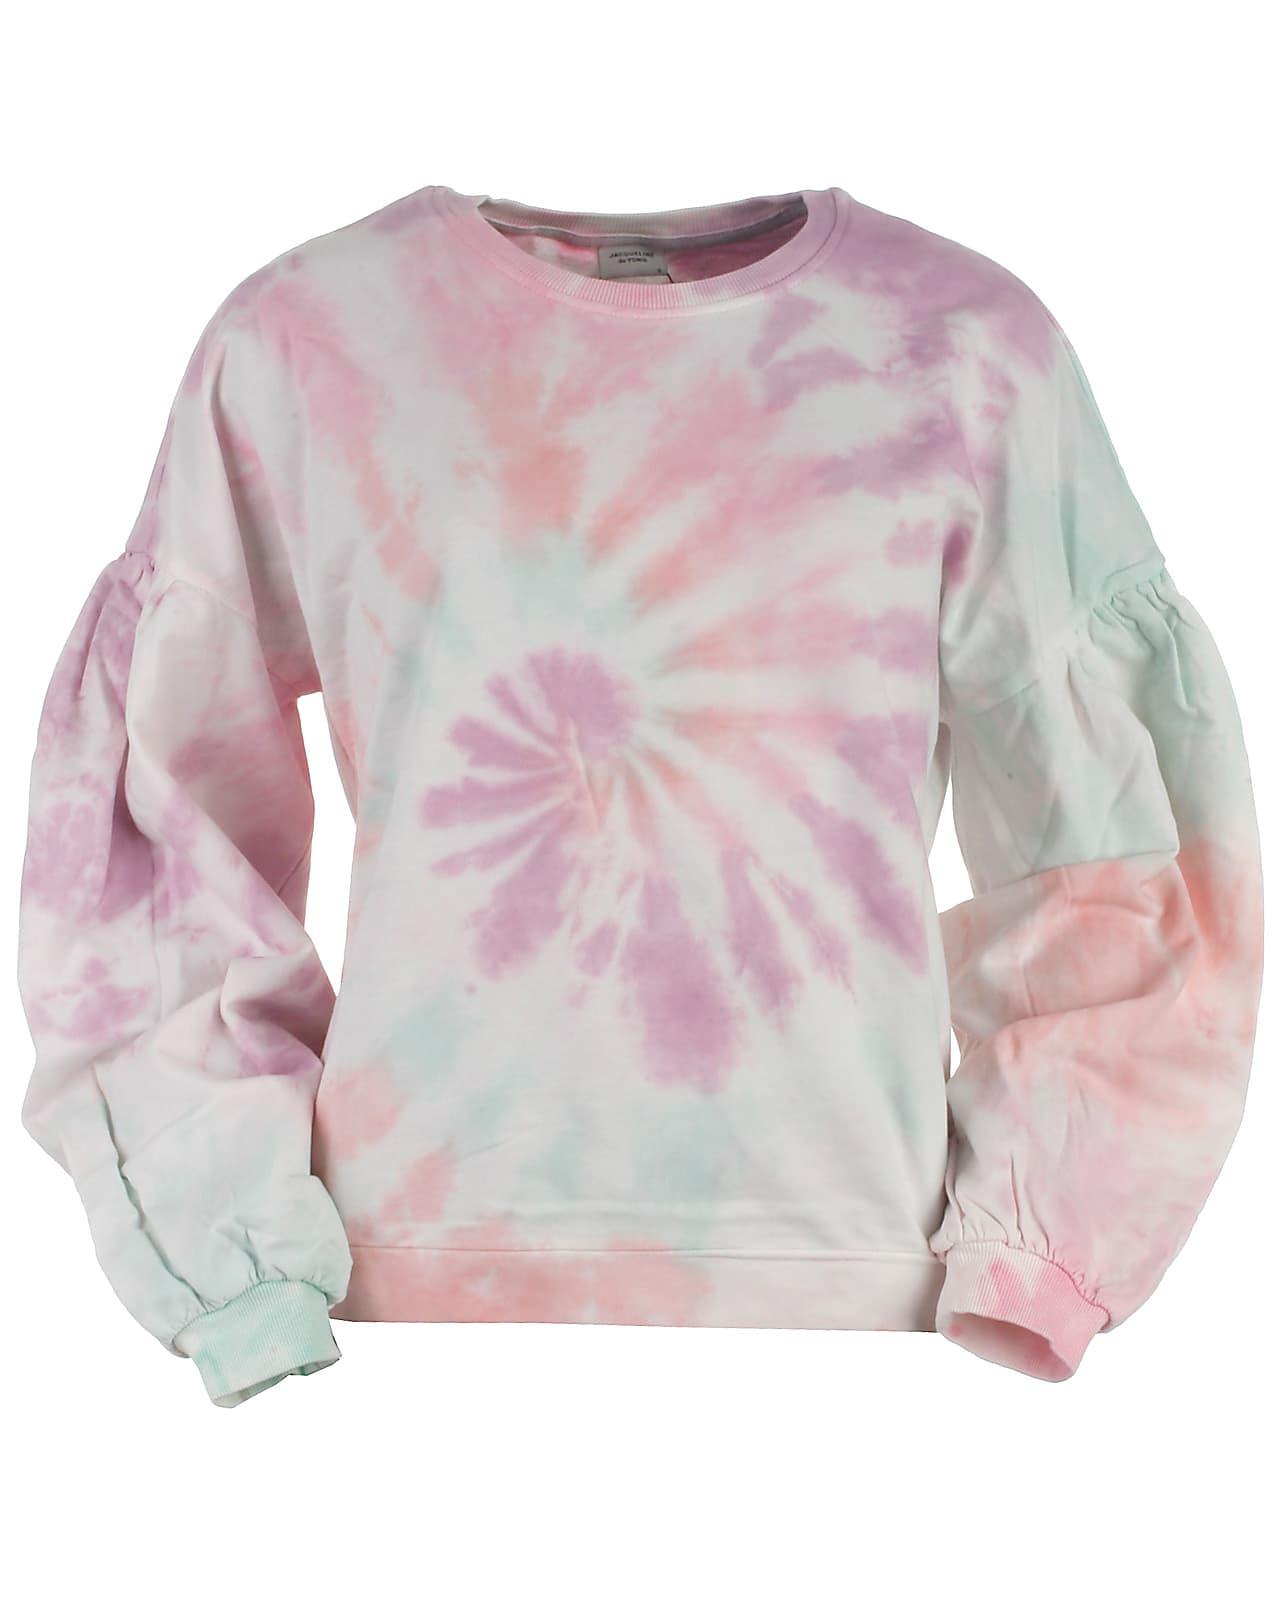 Jacqueline de Yong sweatshirt, Candy, clouddancerspiral